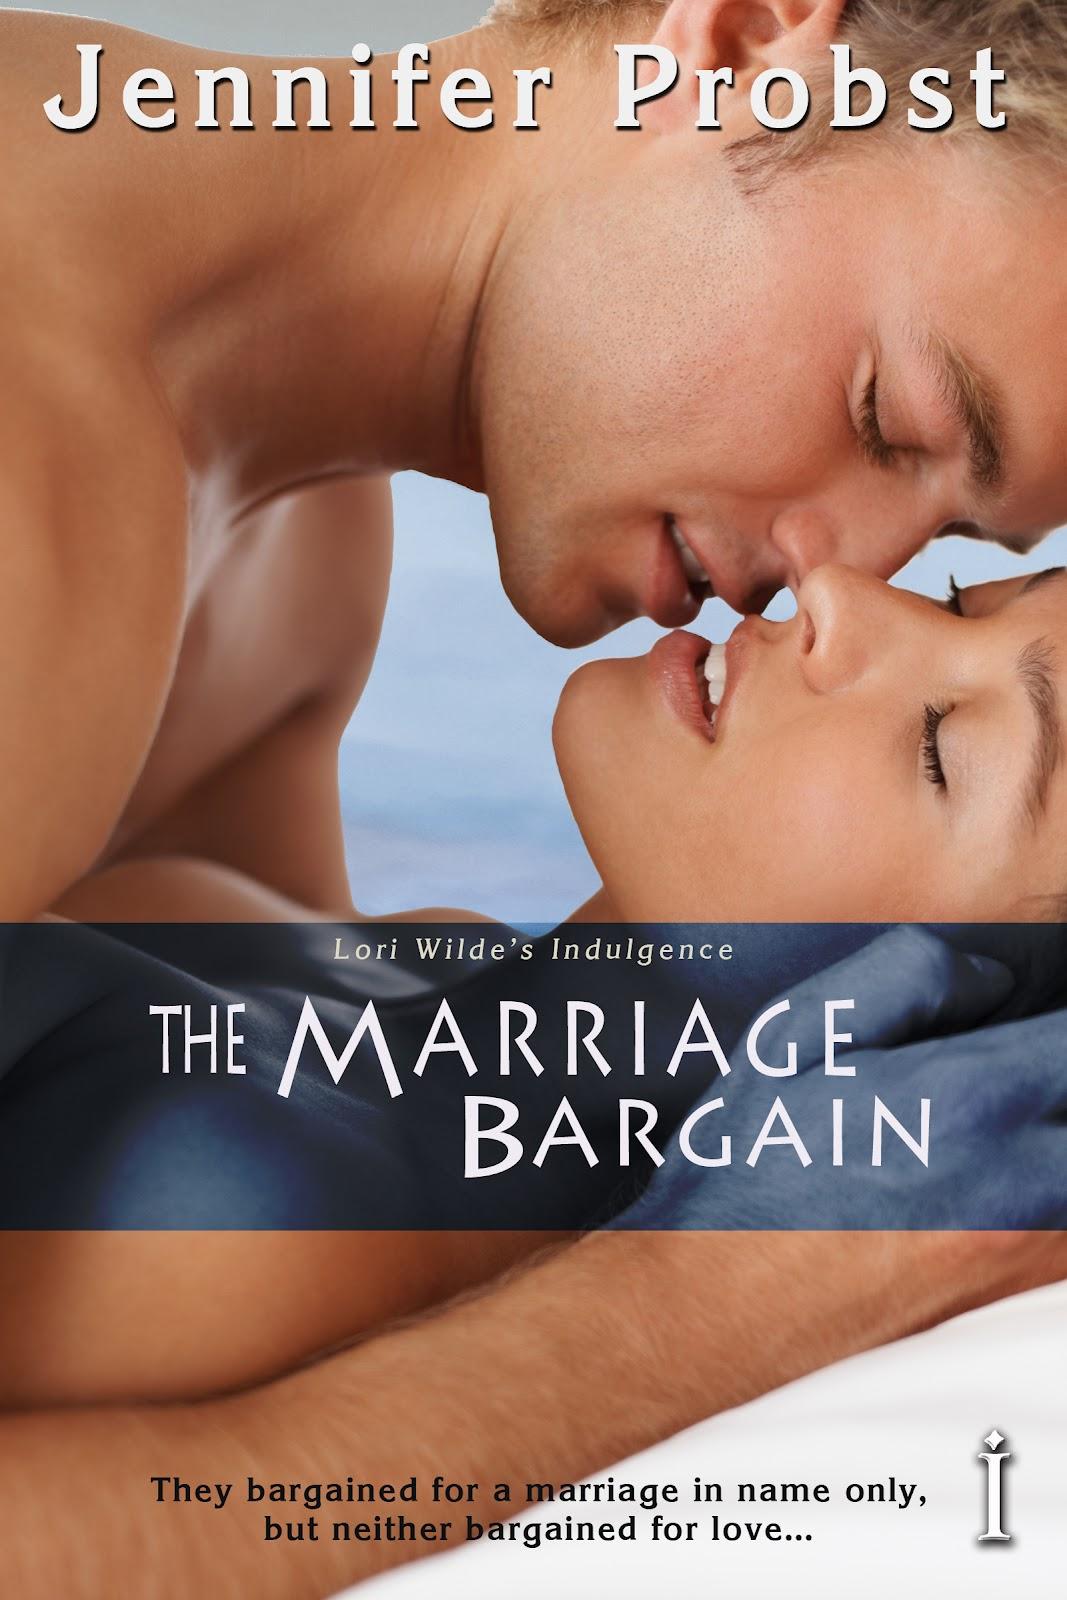 The Marriage Bargain – Jennifer Probst